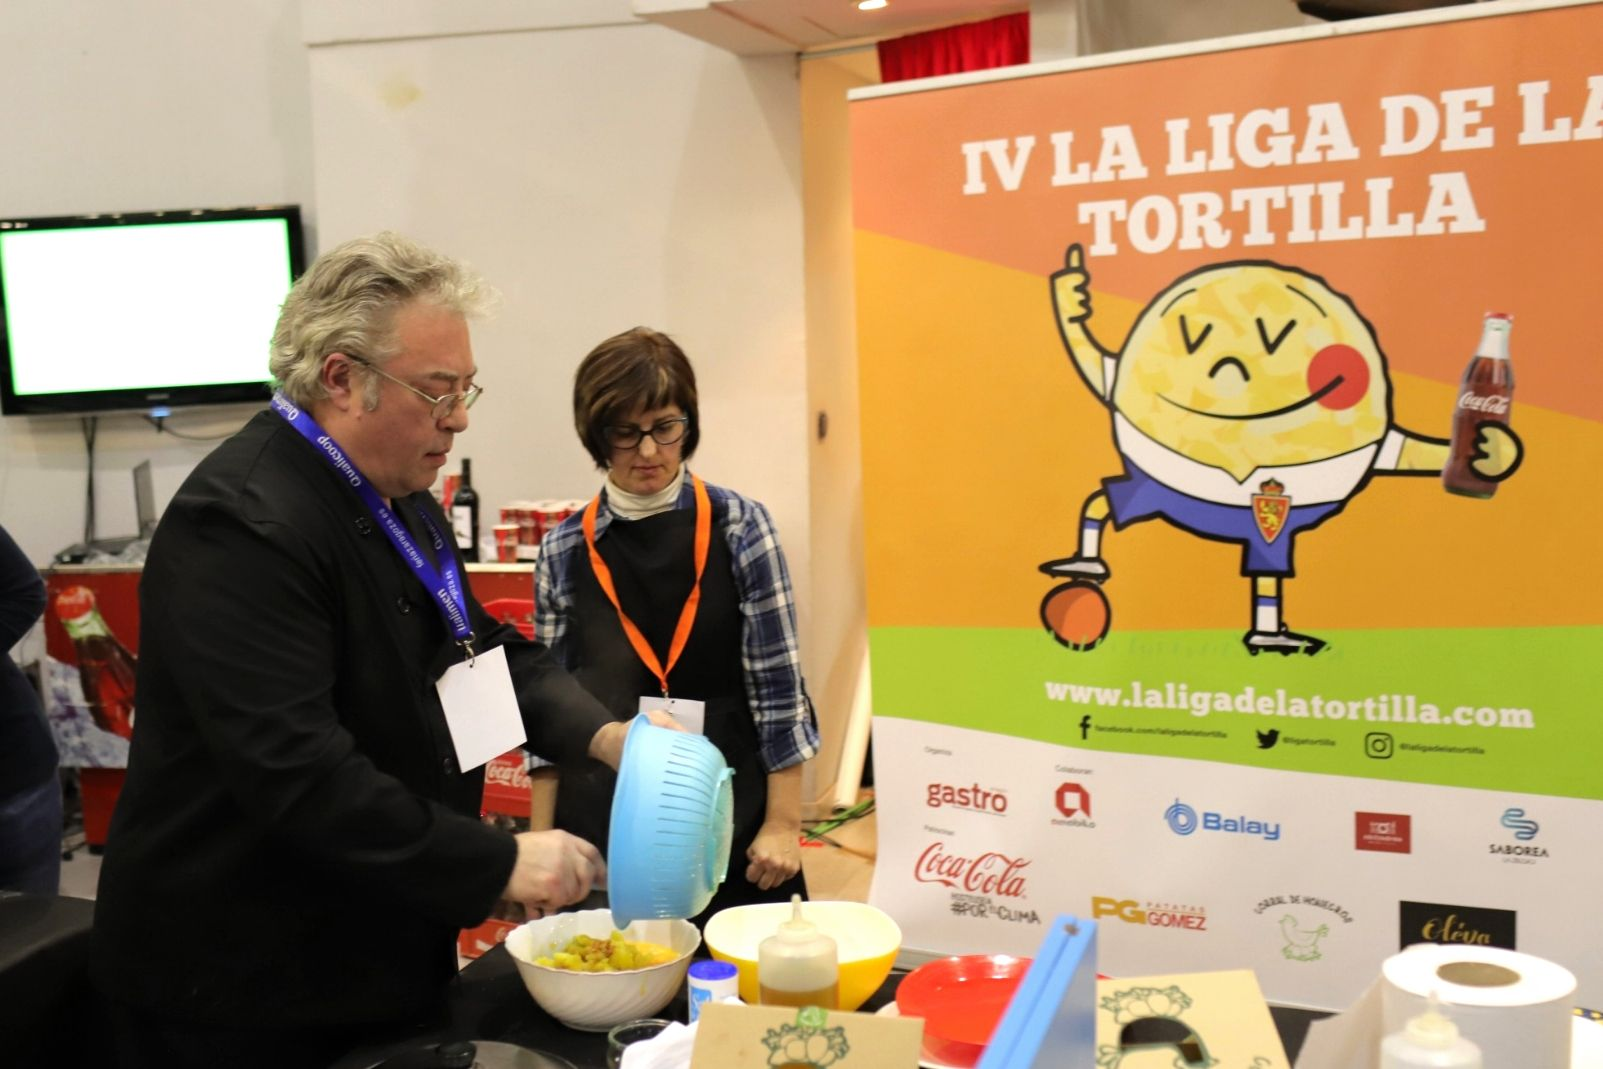 Cabuchico gana la IV Liga de la Tortilla en Zaragoza